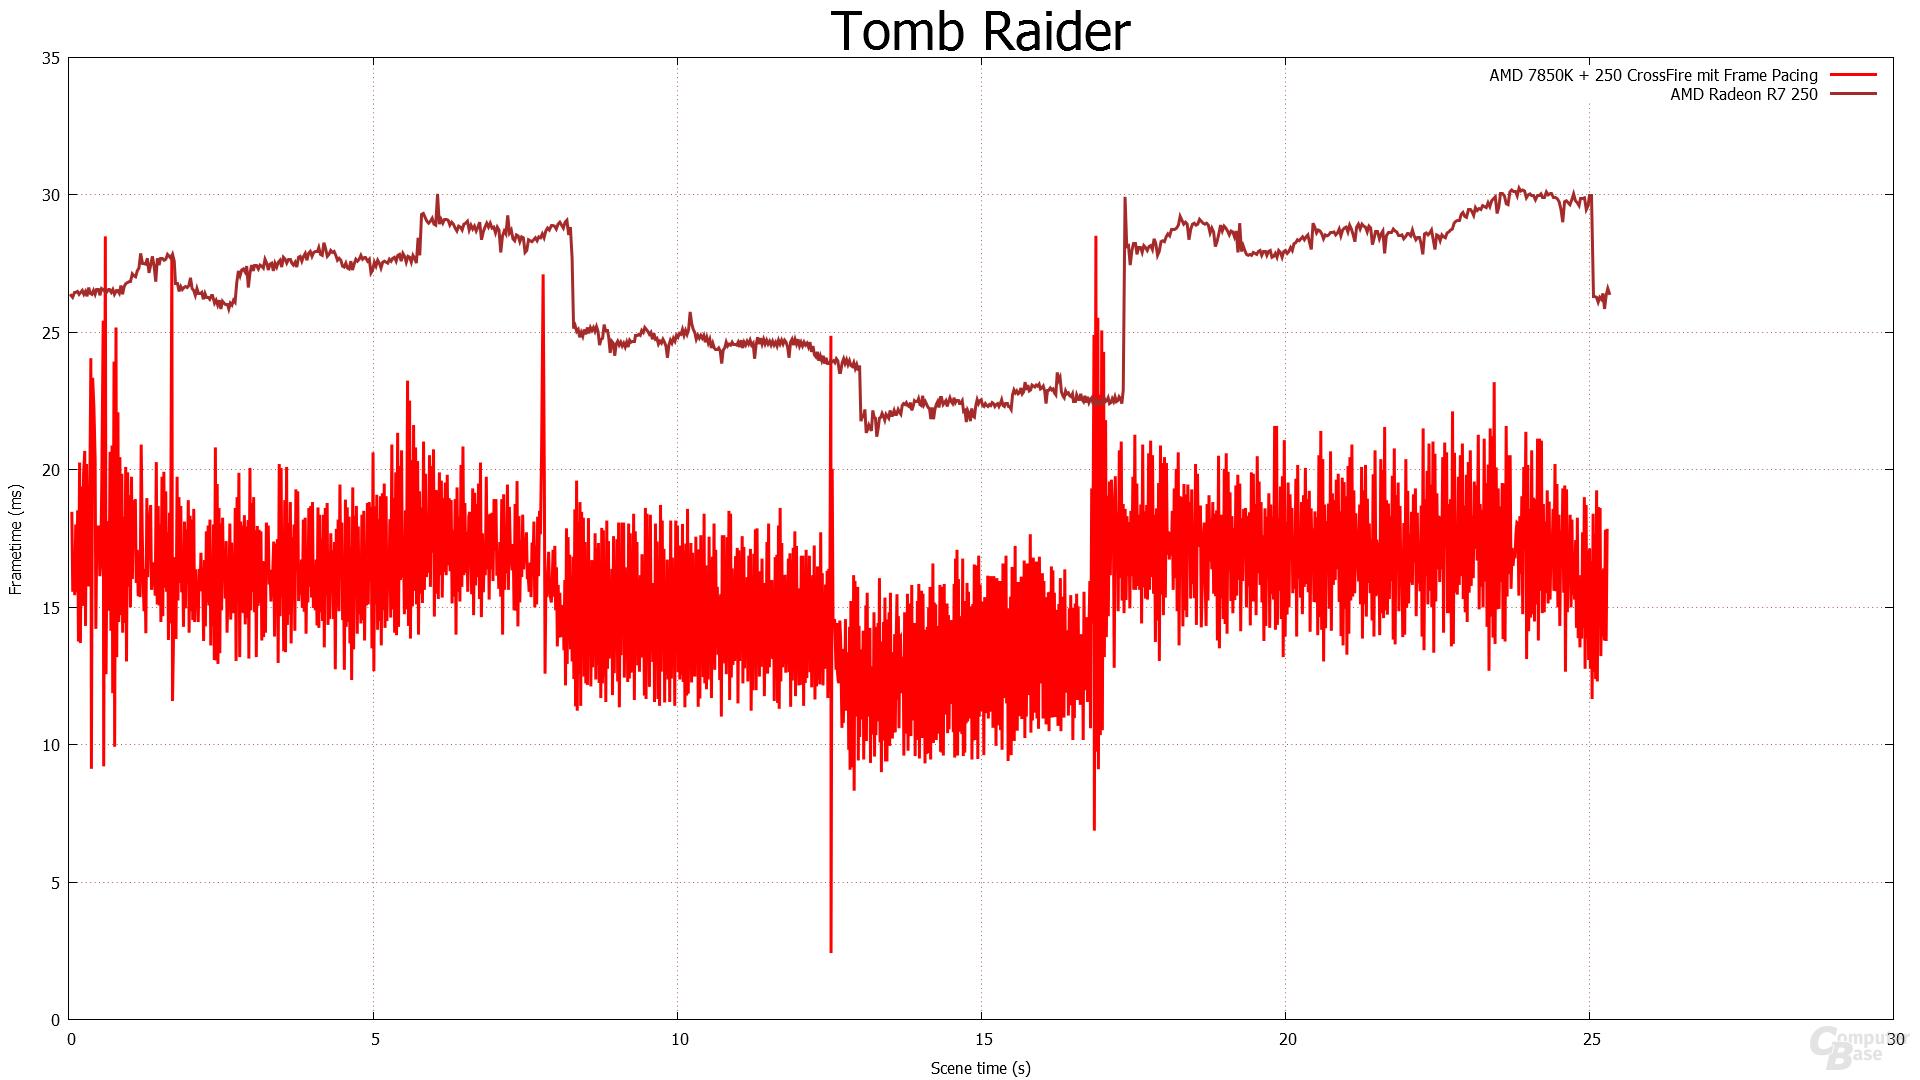 Frametimes - Tomb Raider